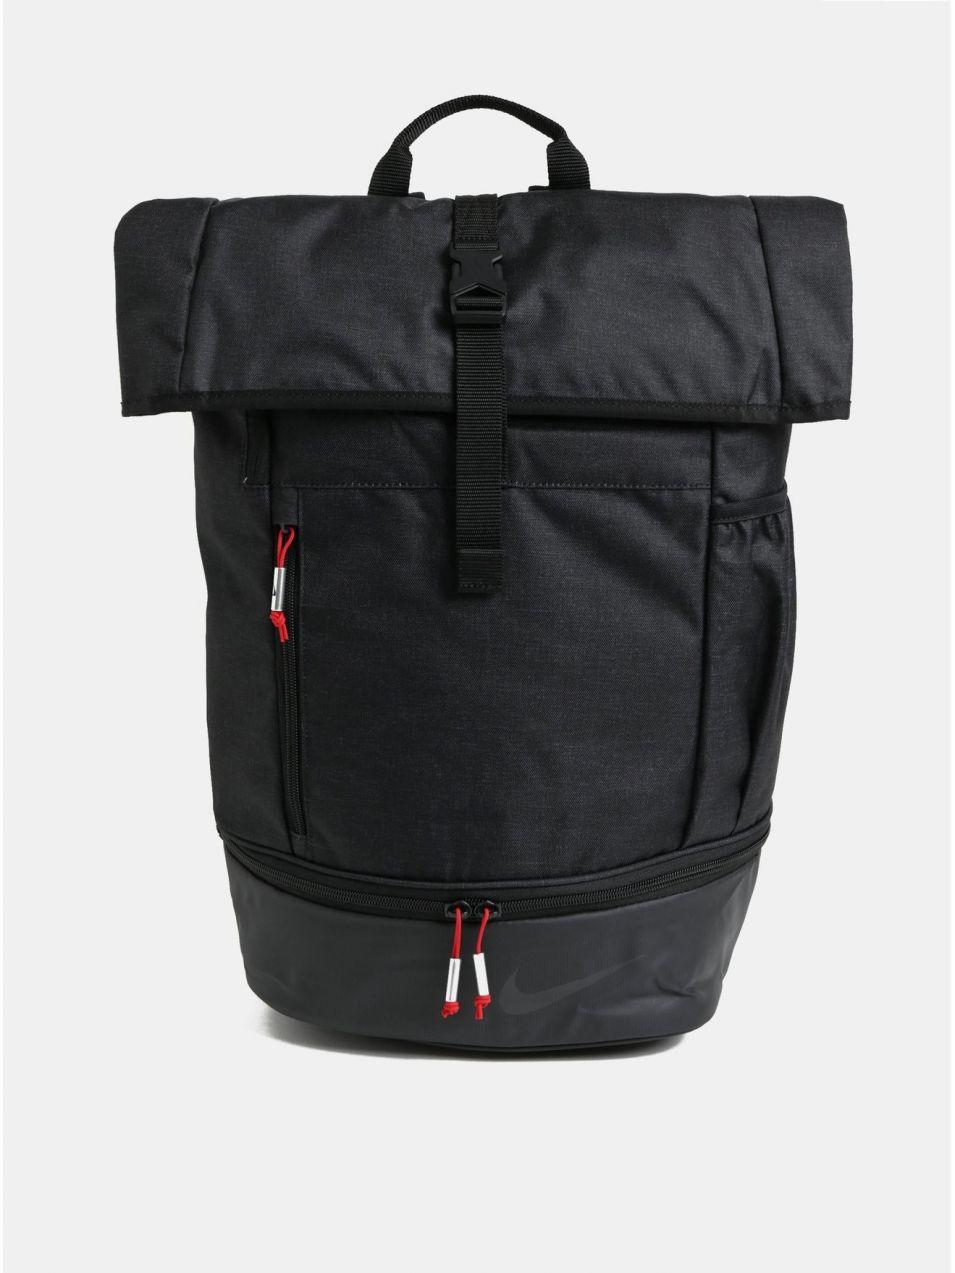 bd04fa9941 Tmavosivý nepremokavý batoh Nike 26 l značky Nike - Lovely.sk